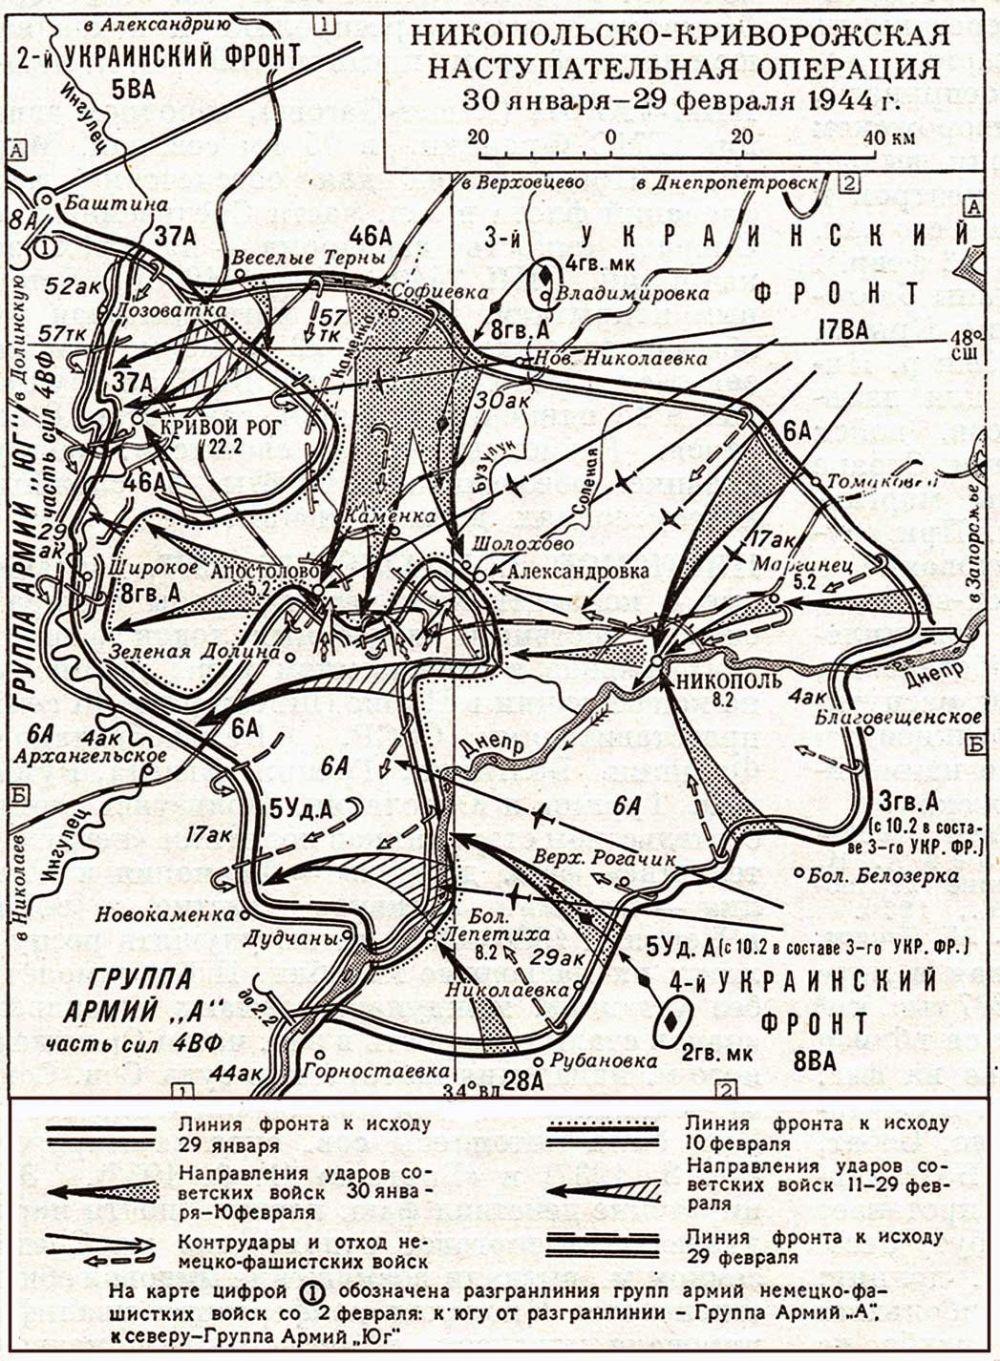 2-й сталинский удар карта3